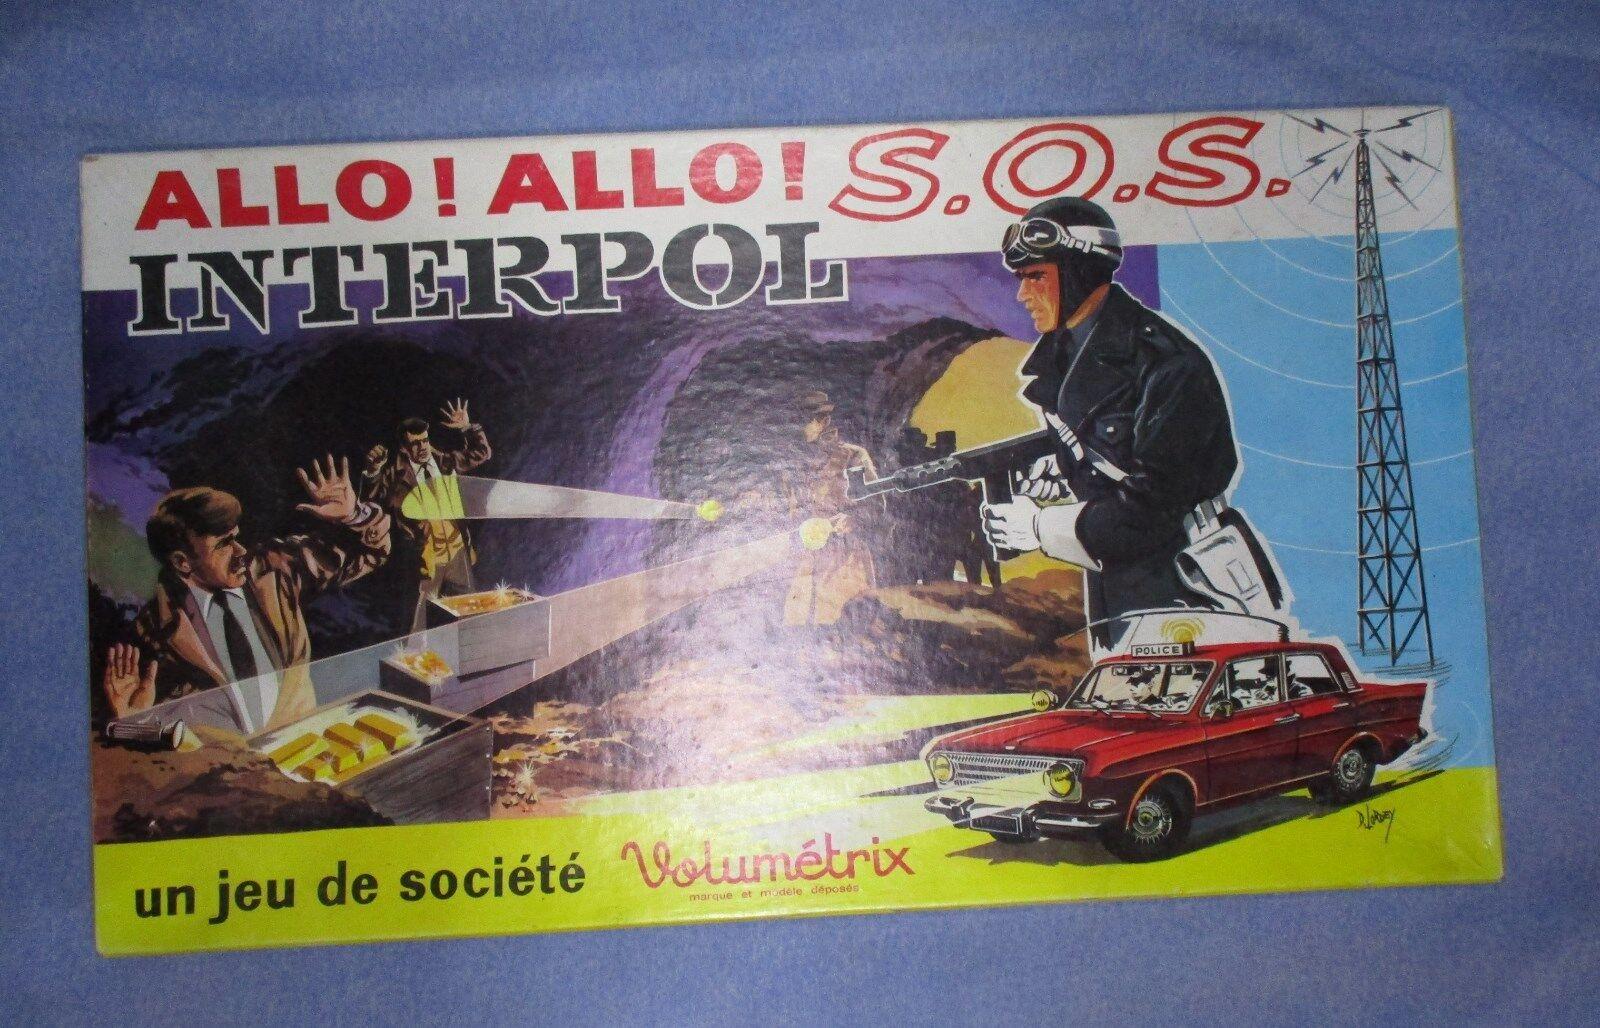 AE807 VOLUMETRIX ALLO SOS INTERPOL JEU SOCIETE SUPERBE ETAT POLICE